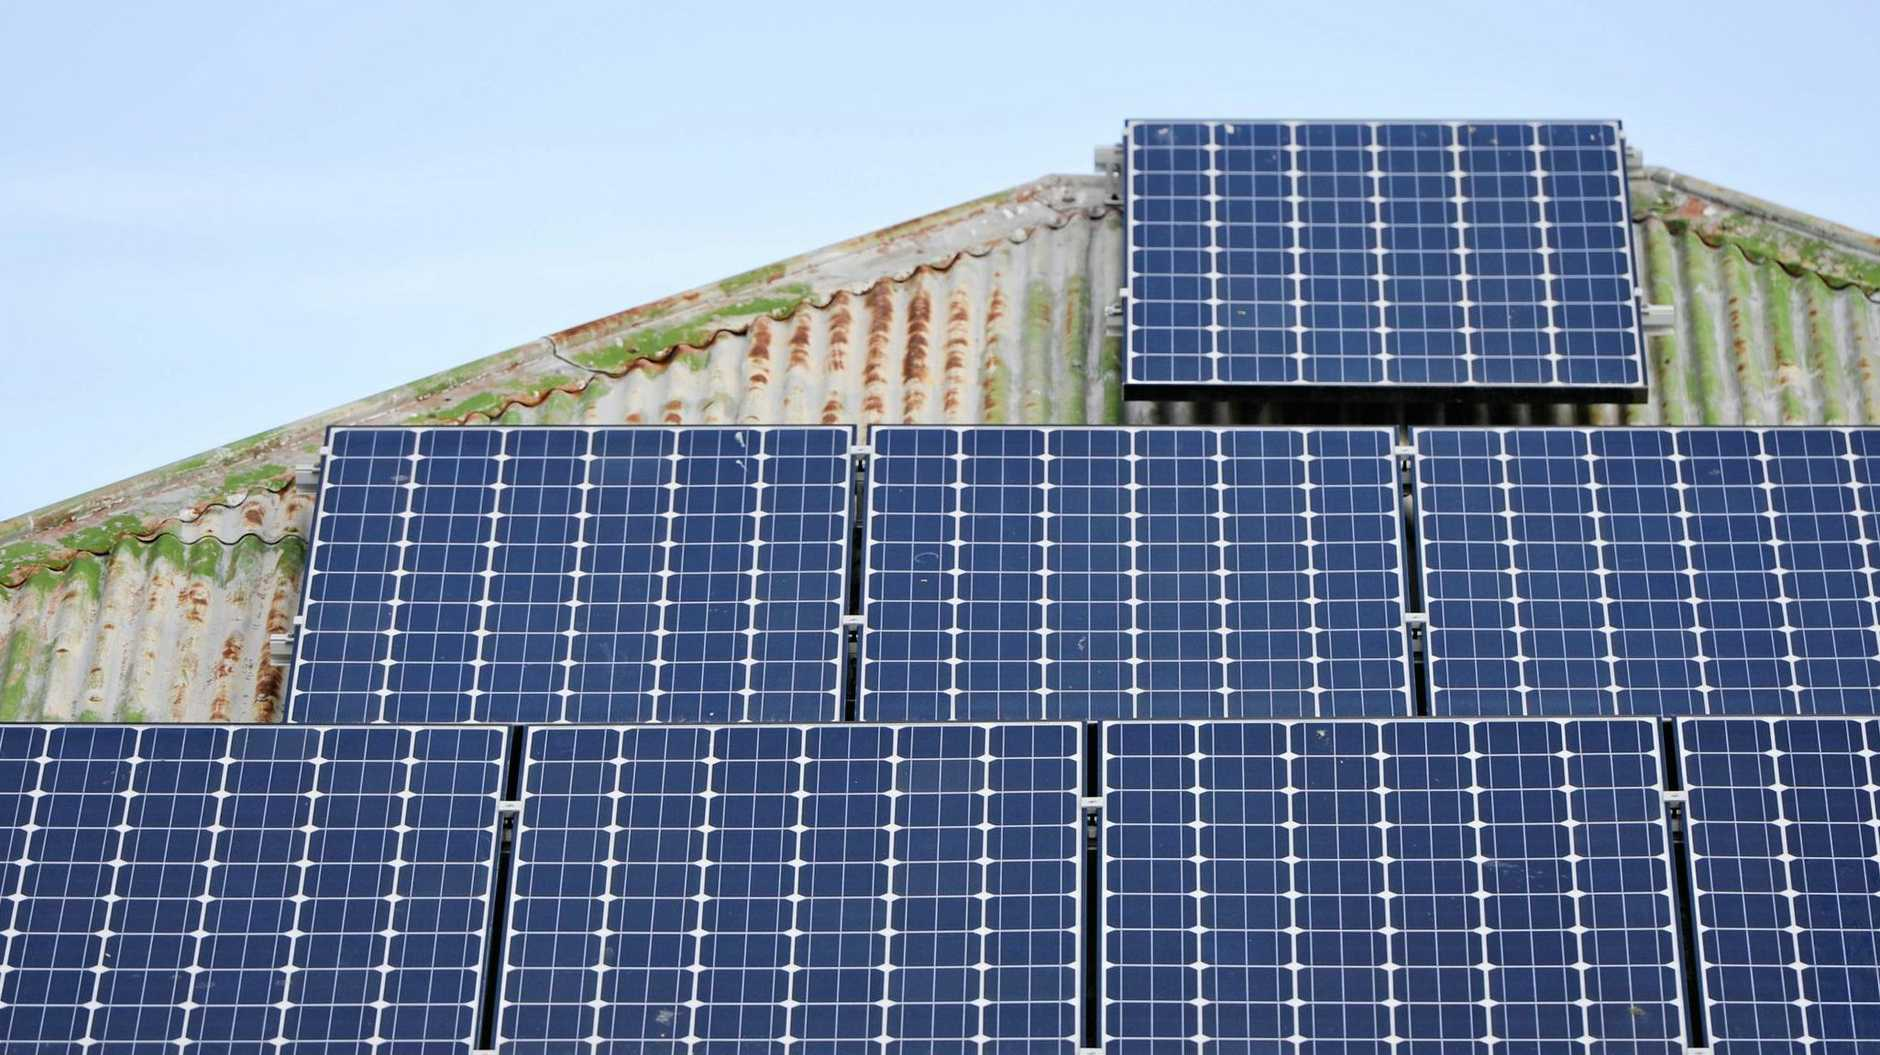 Solar panels may not be rainbow solution.